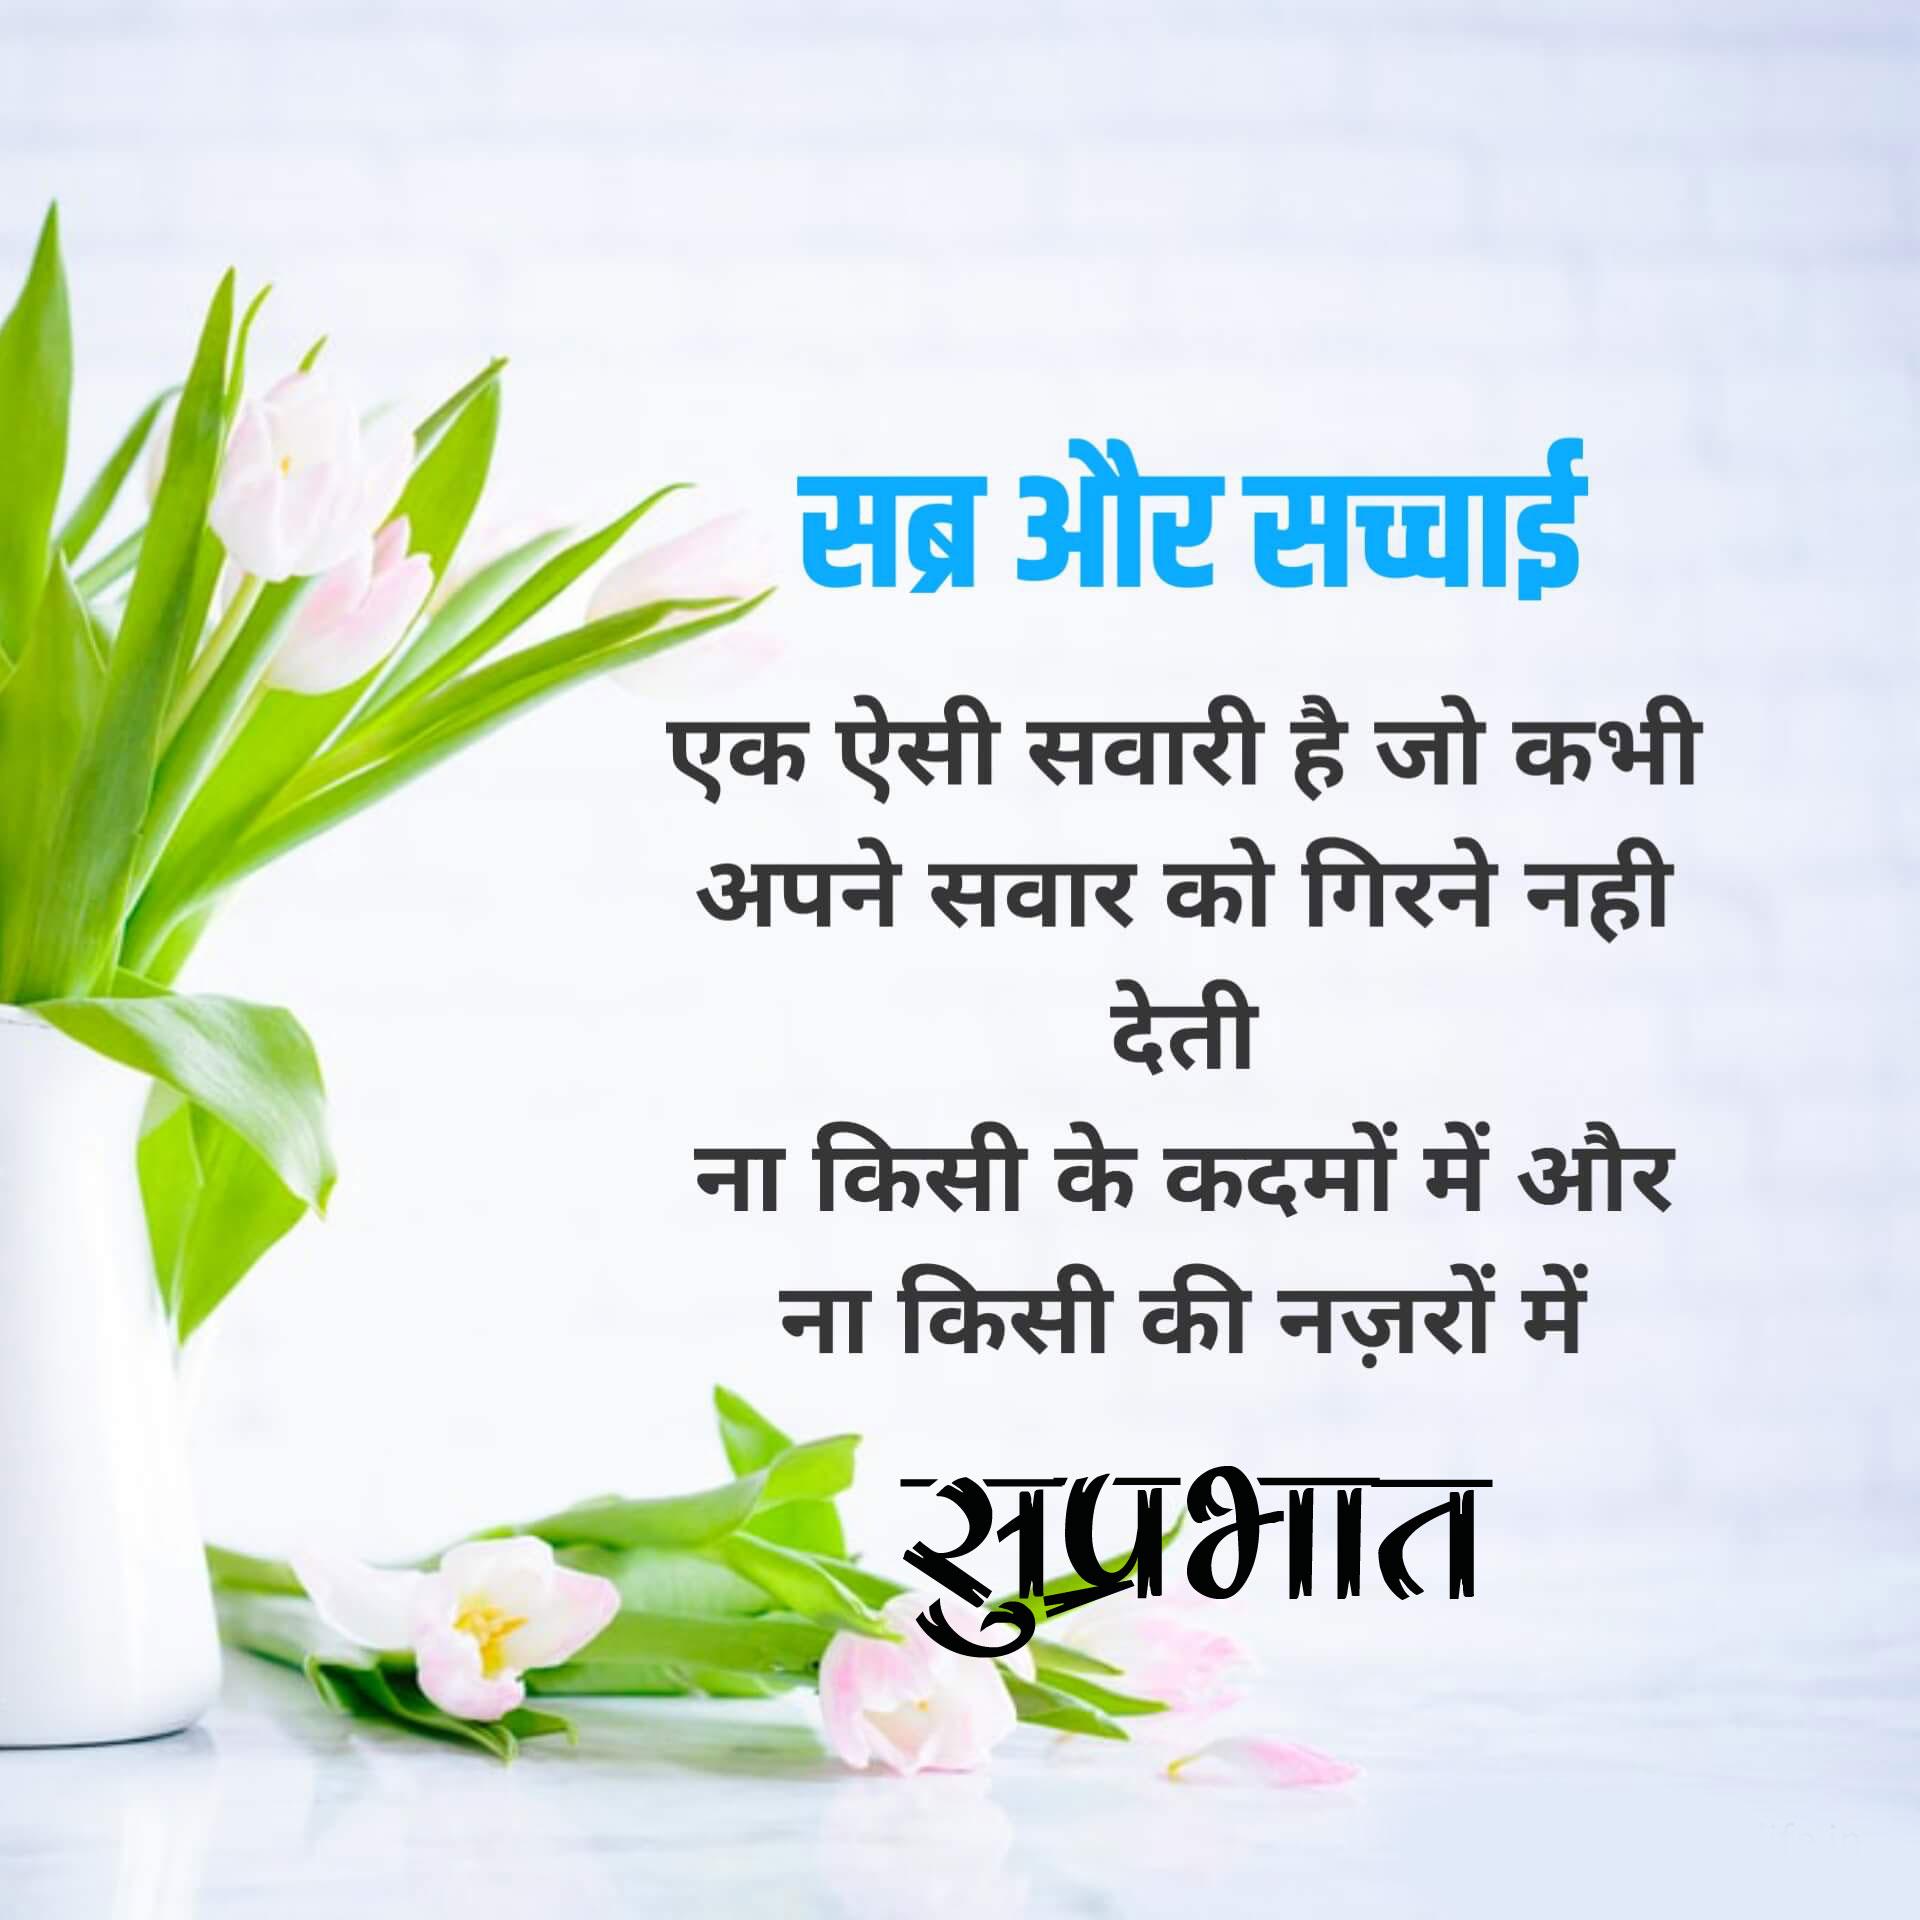 hindi suvichar Latest Suprabhat Images photo